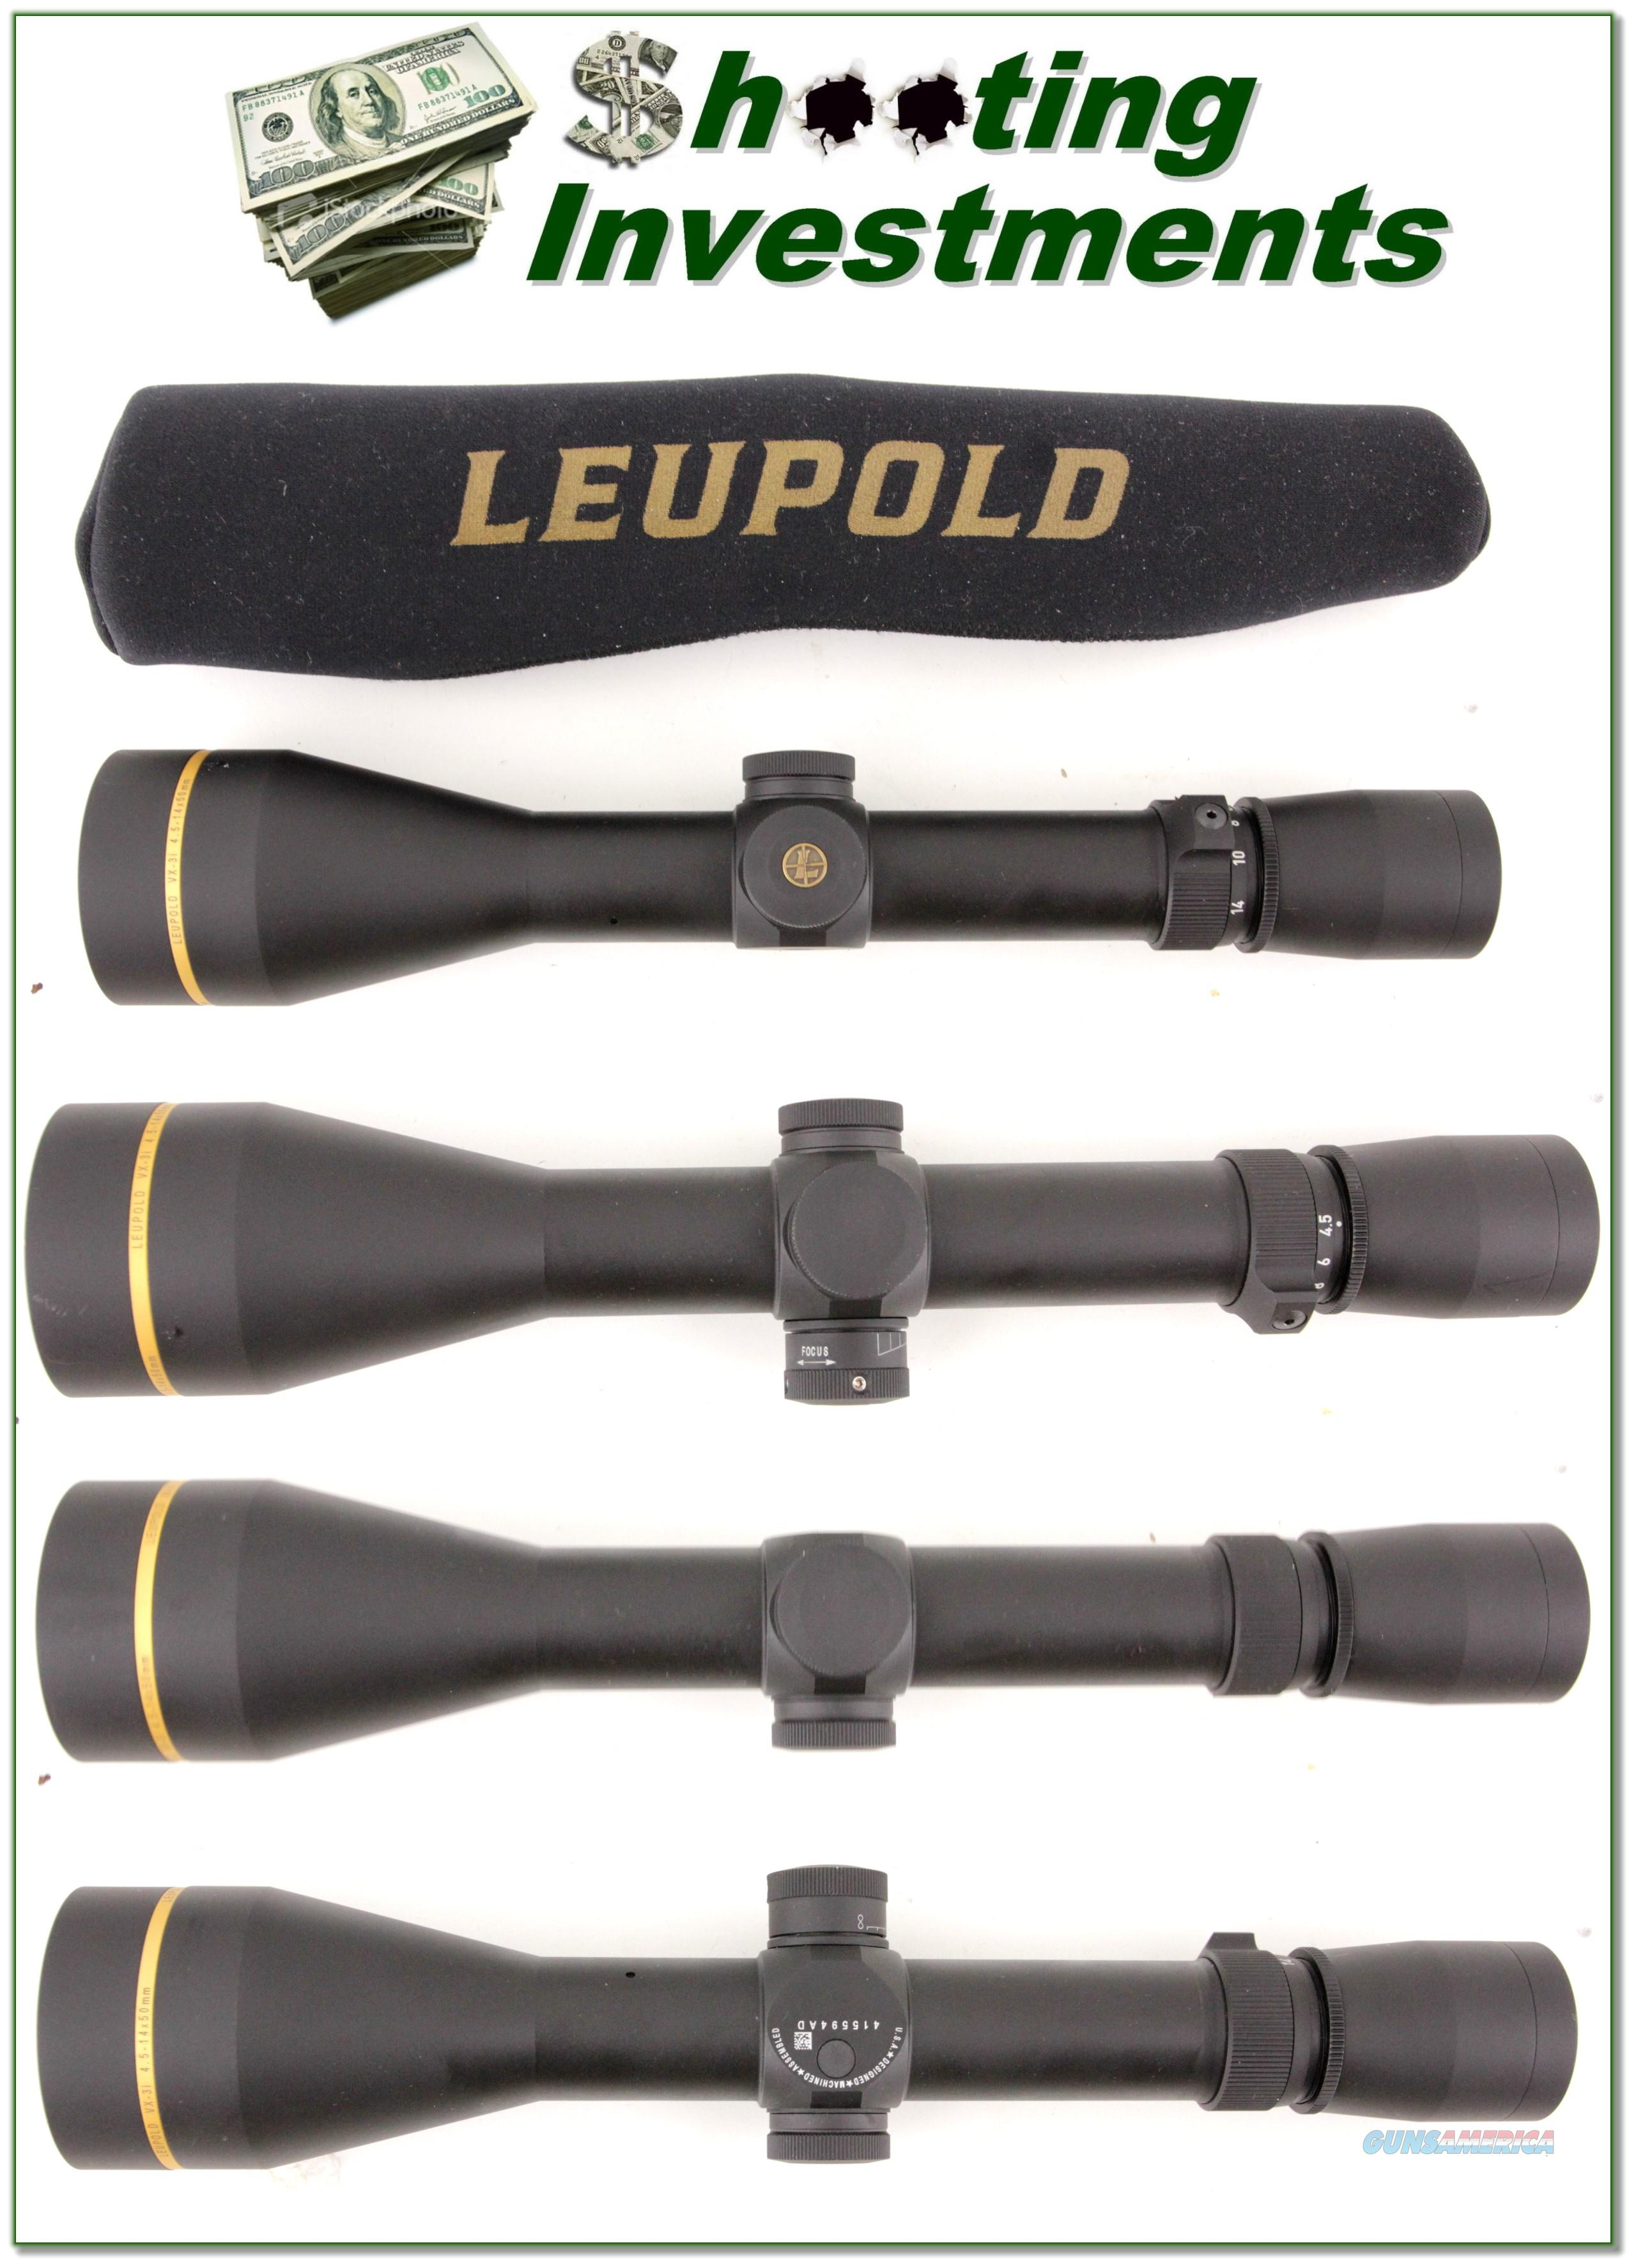 New Condition Leupold VX-3i 4.5-14x50mm 30mm AO  Non-Guns > Scopes/Mounts/Rings & Optics > Rifle Scopes > Variable Focal Length